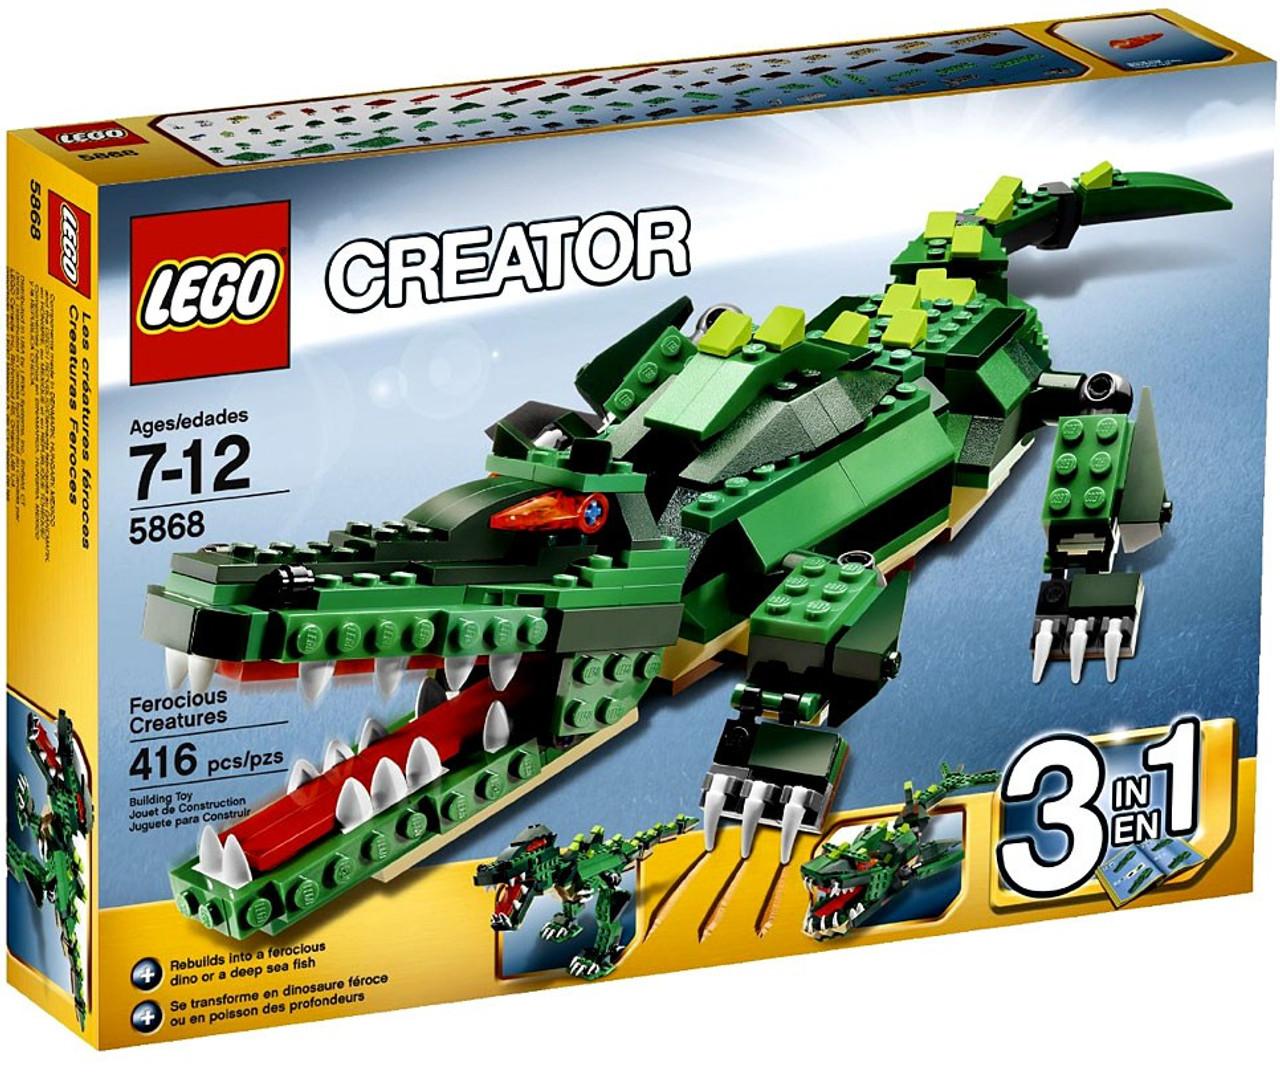 LEGO Creator Ferocious Creatures Set #5868